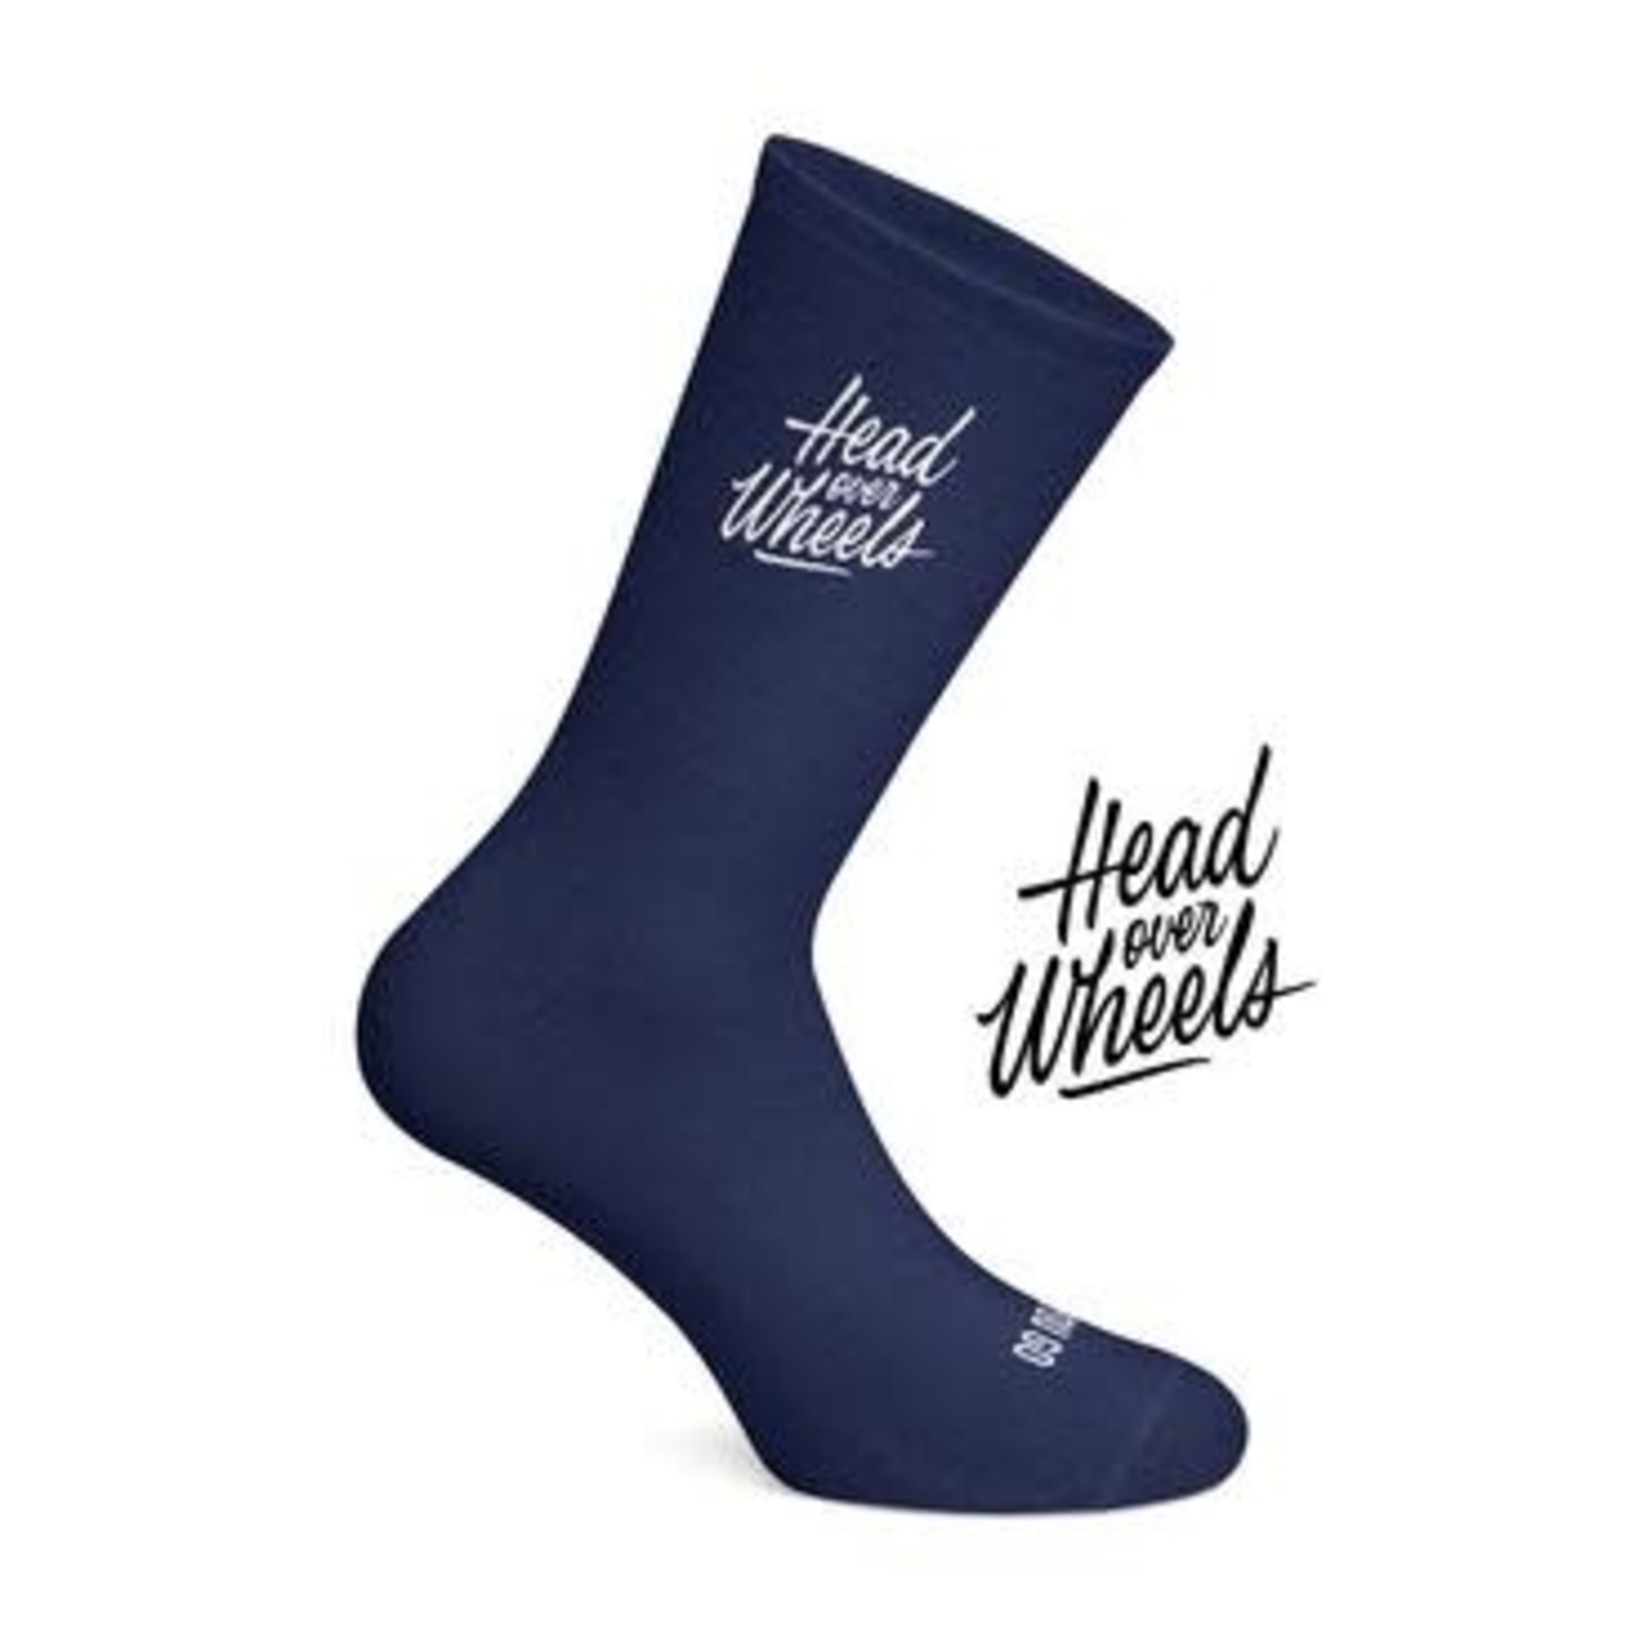 Socks-'Head Over Wheels' navy